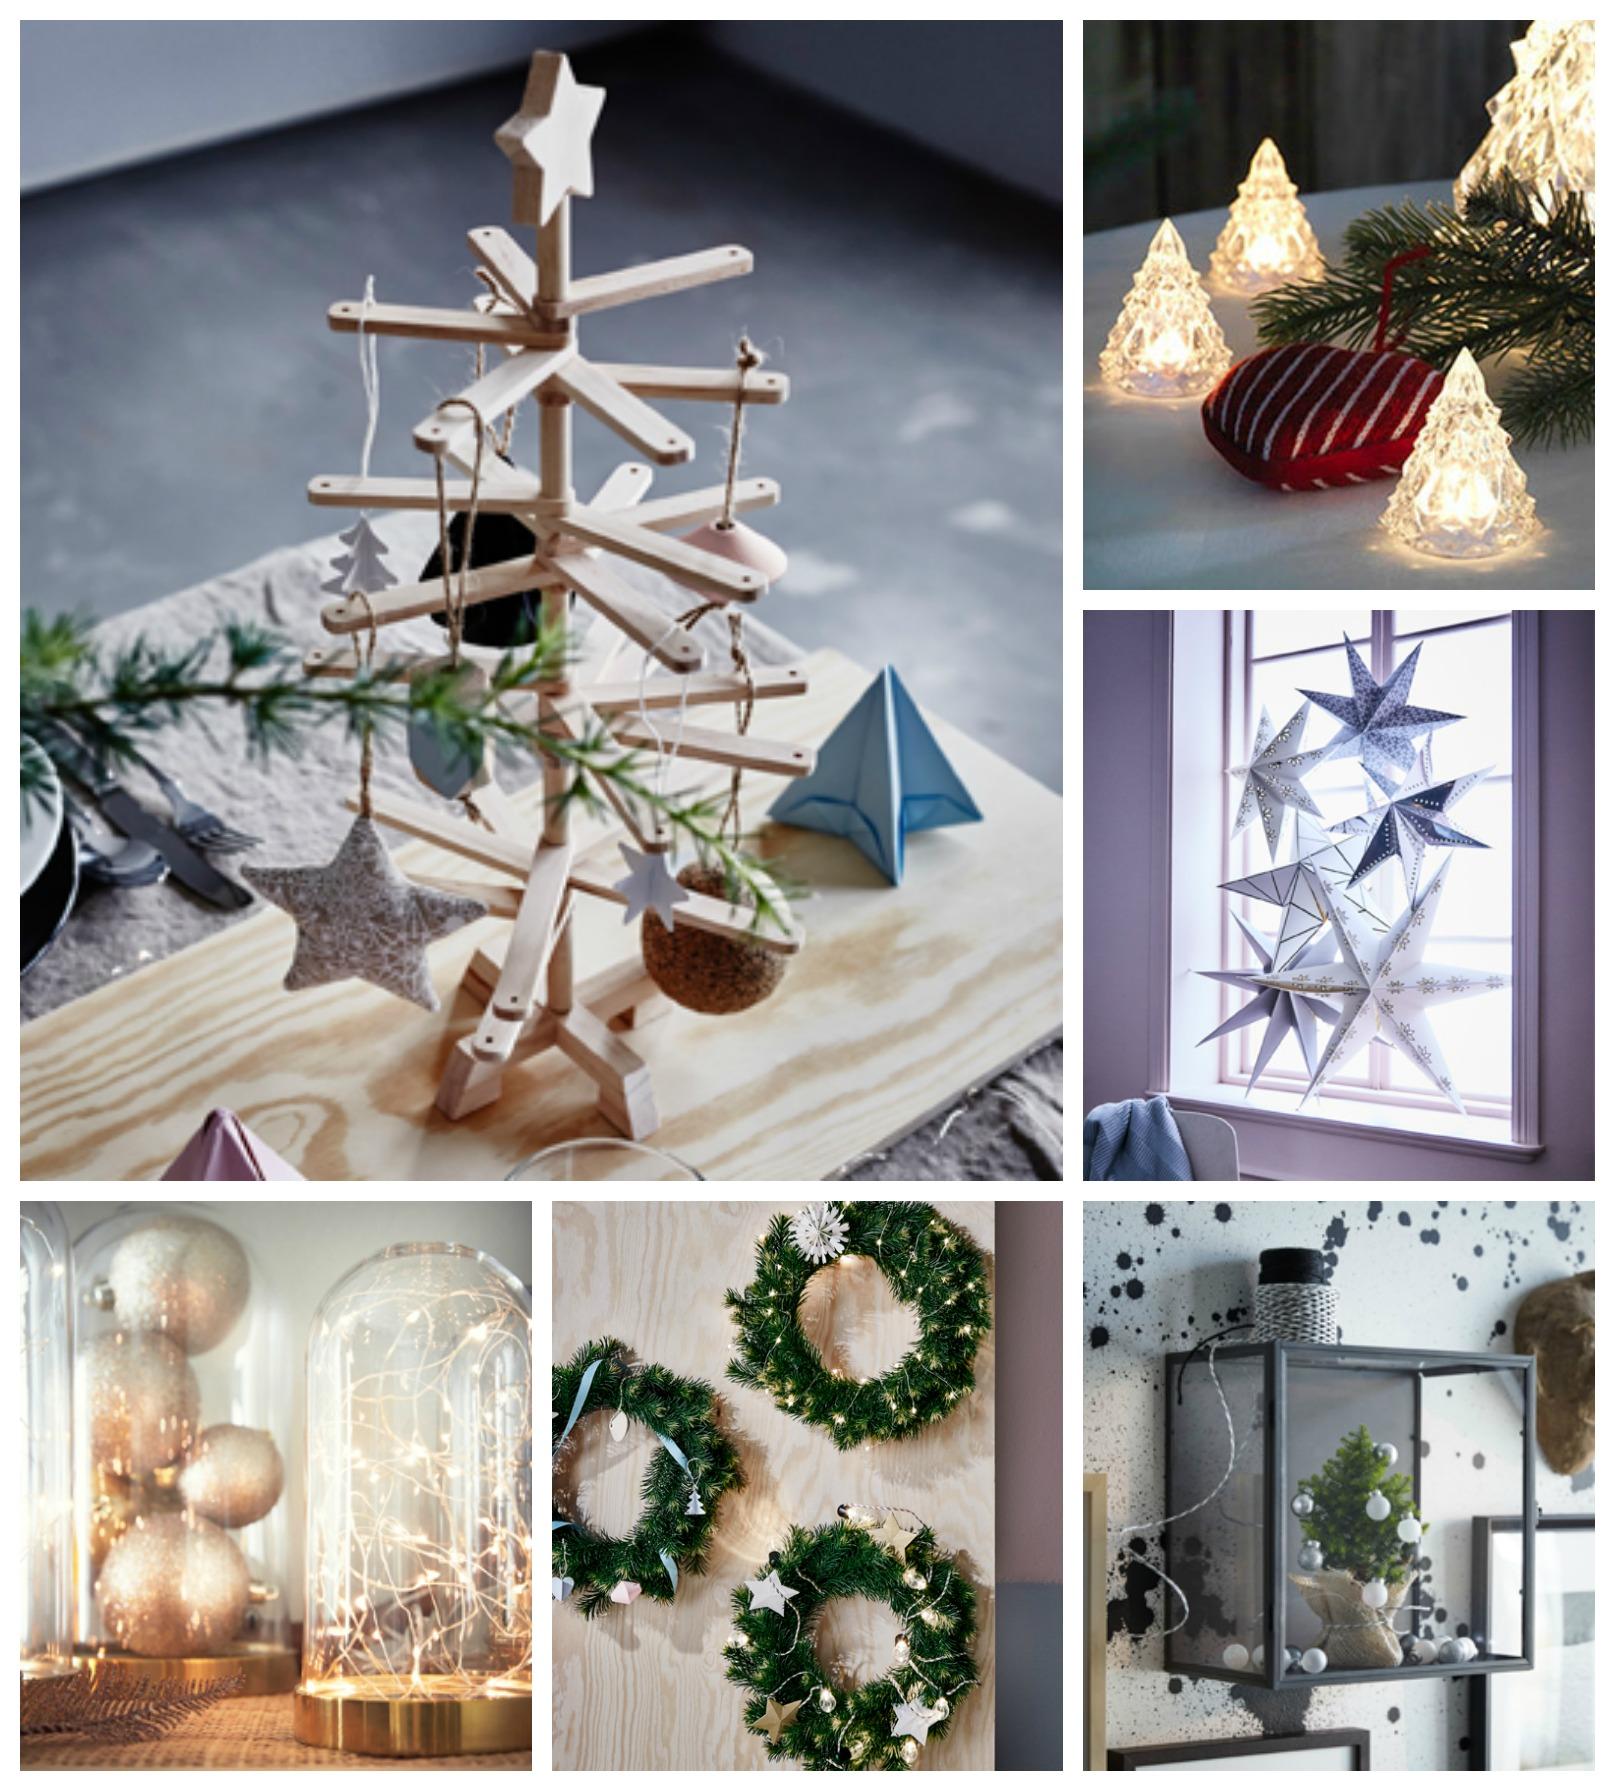 Decorazioni natalizie 2017 ikea the house of blog for Ikea natale catalogo 2017